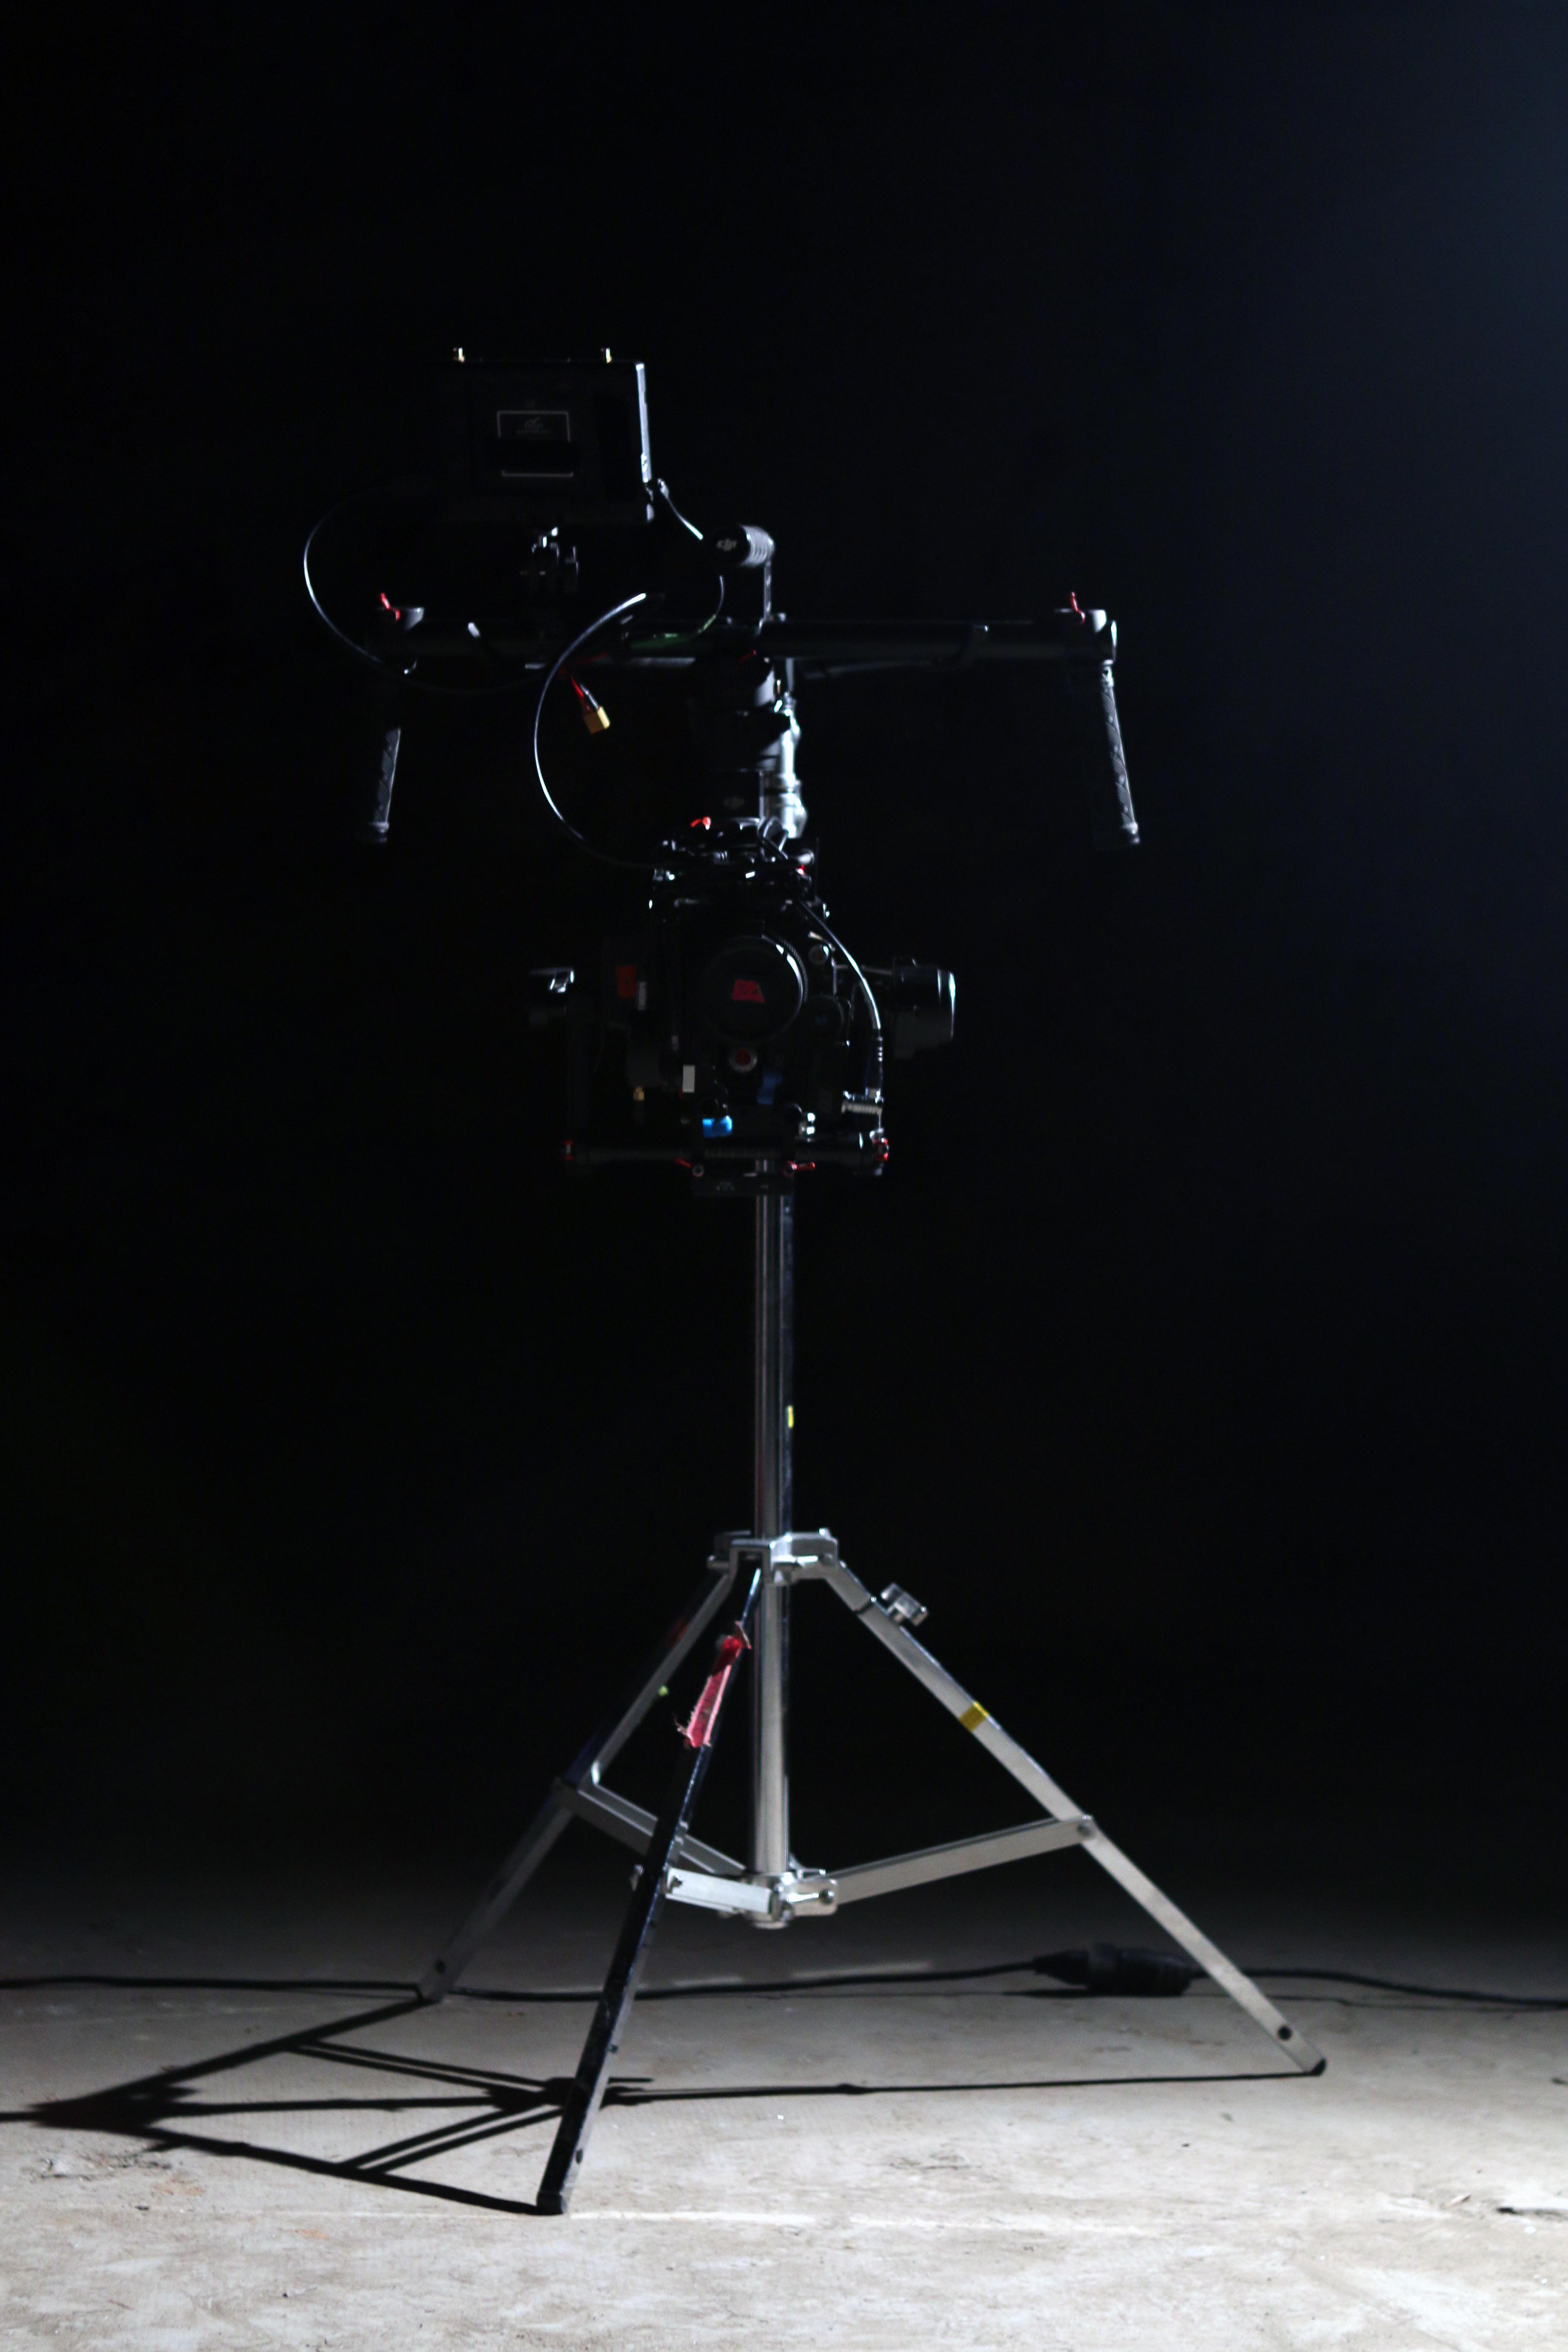 Tournage film publicitaire avec camera red et Ronin